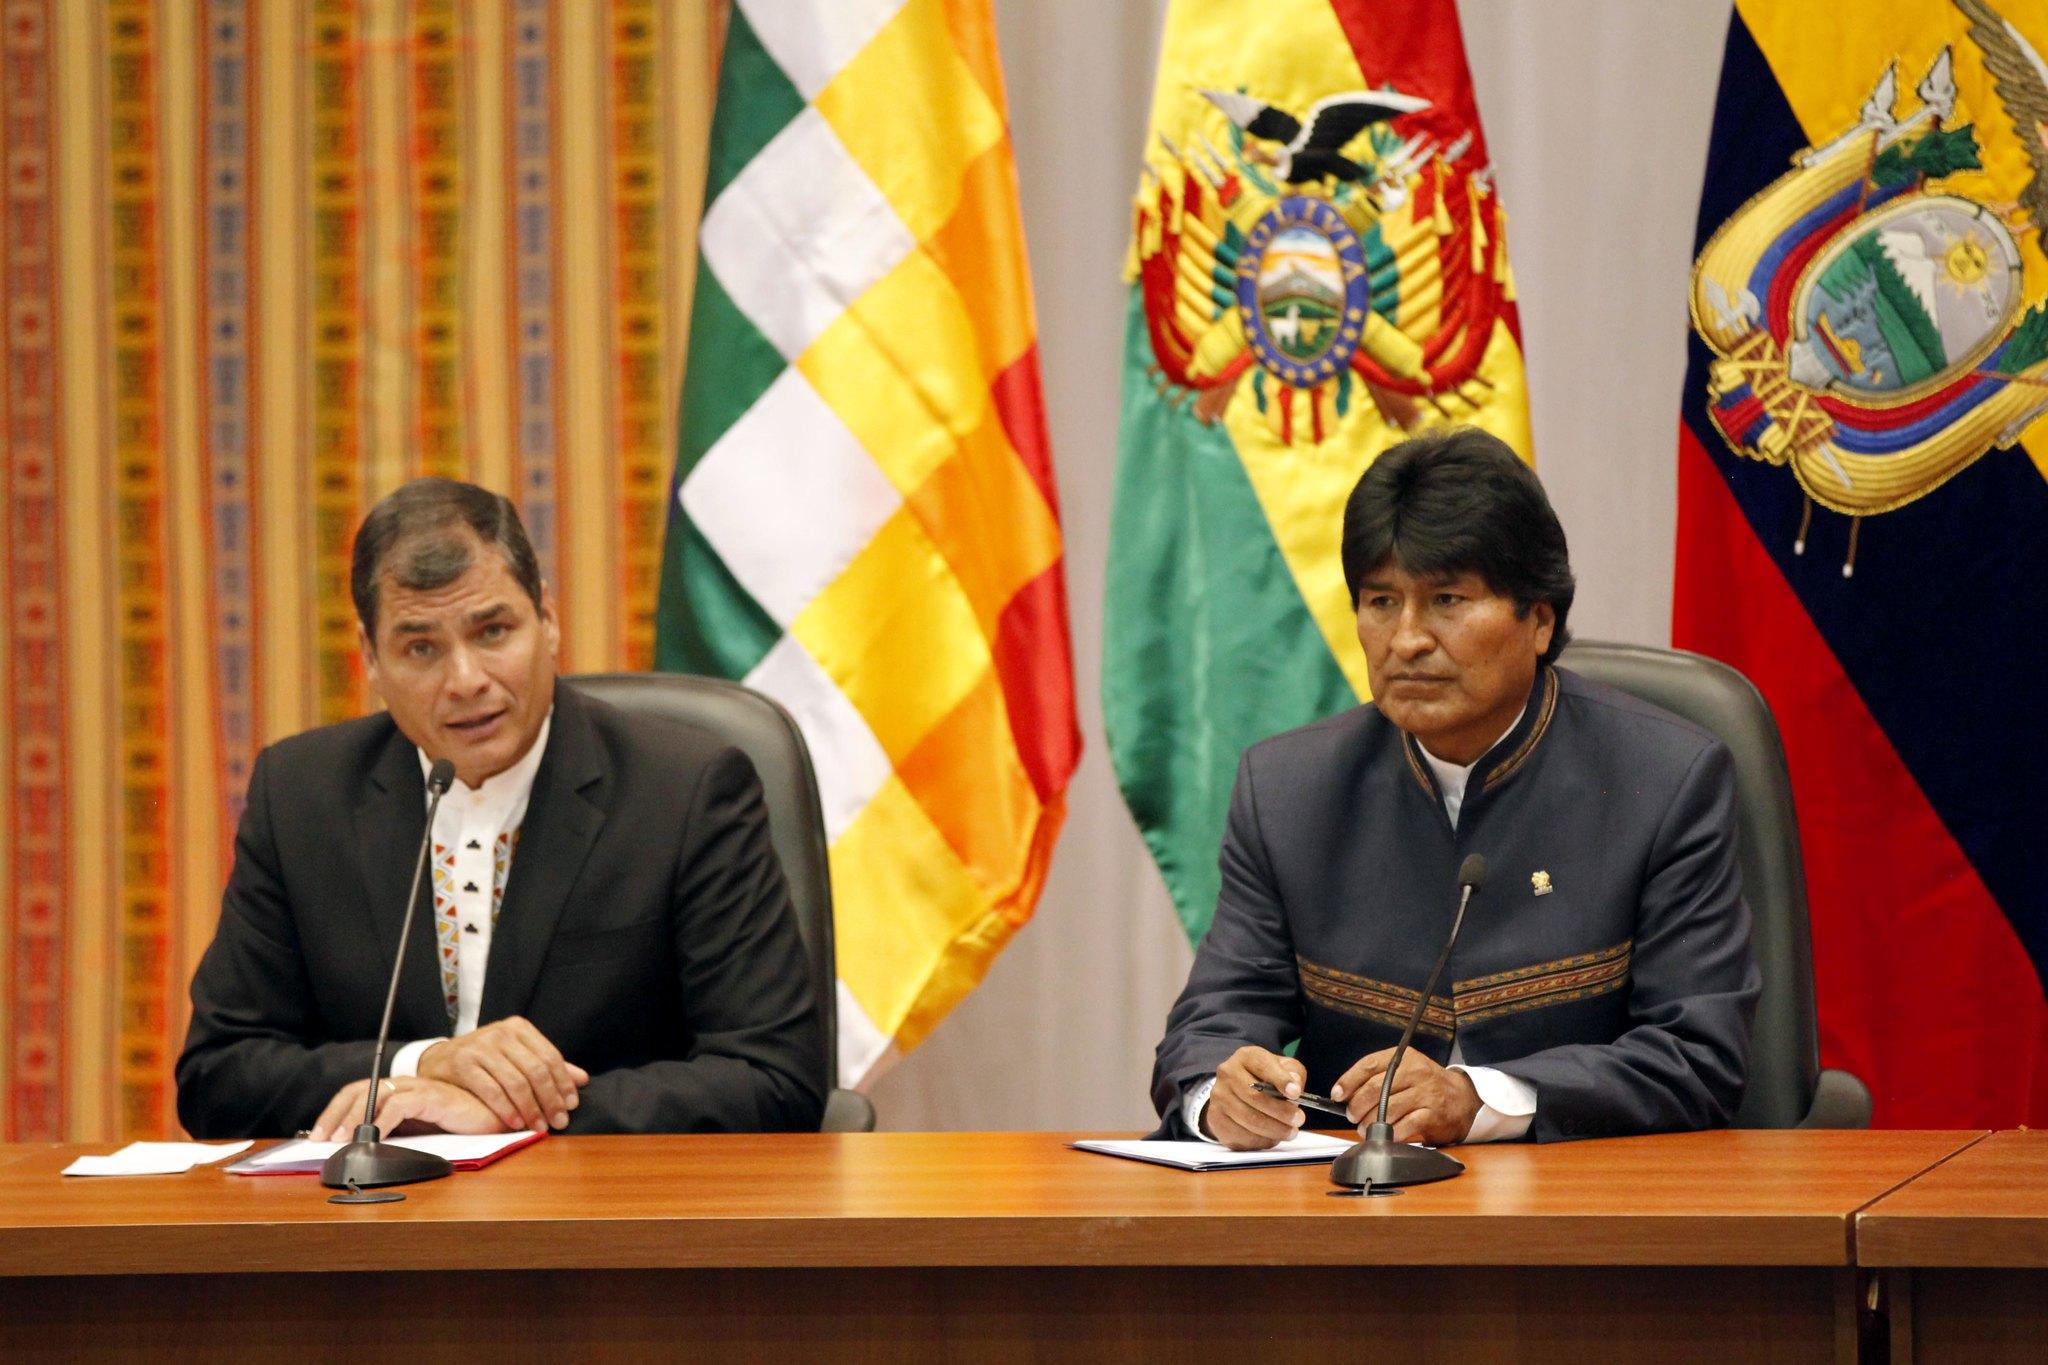 Morale Correa Image Canceleria del Ecuador